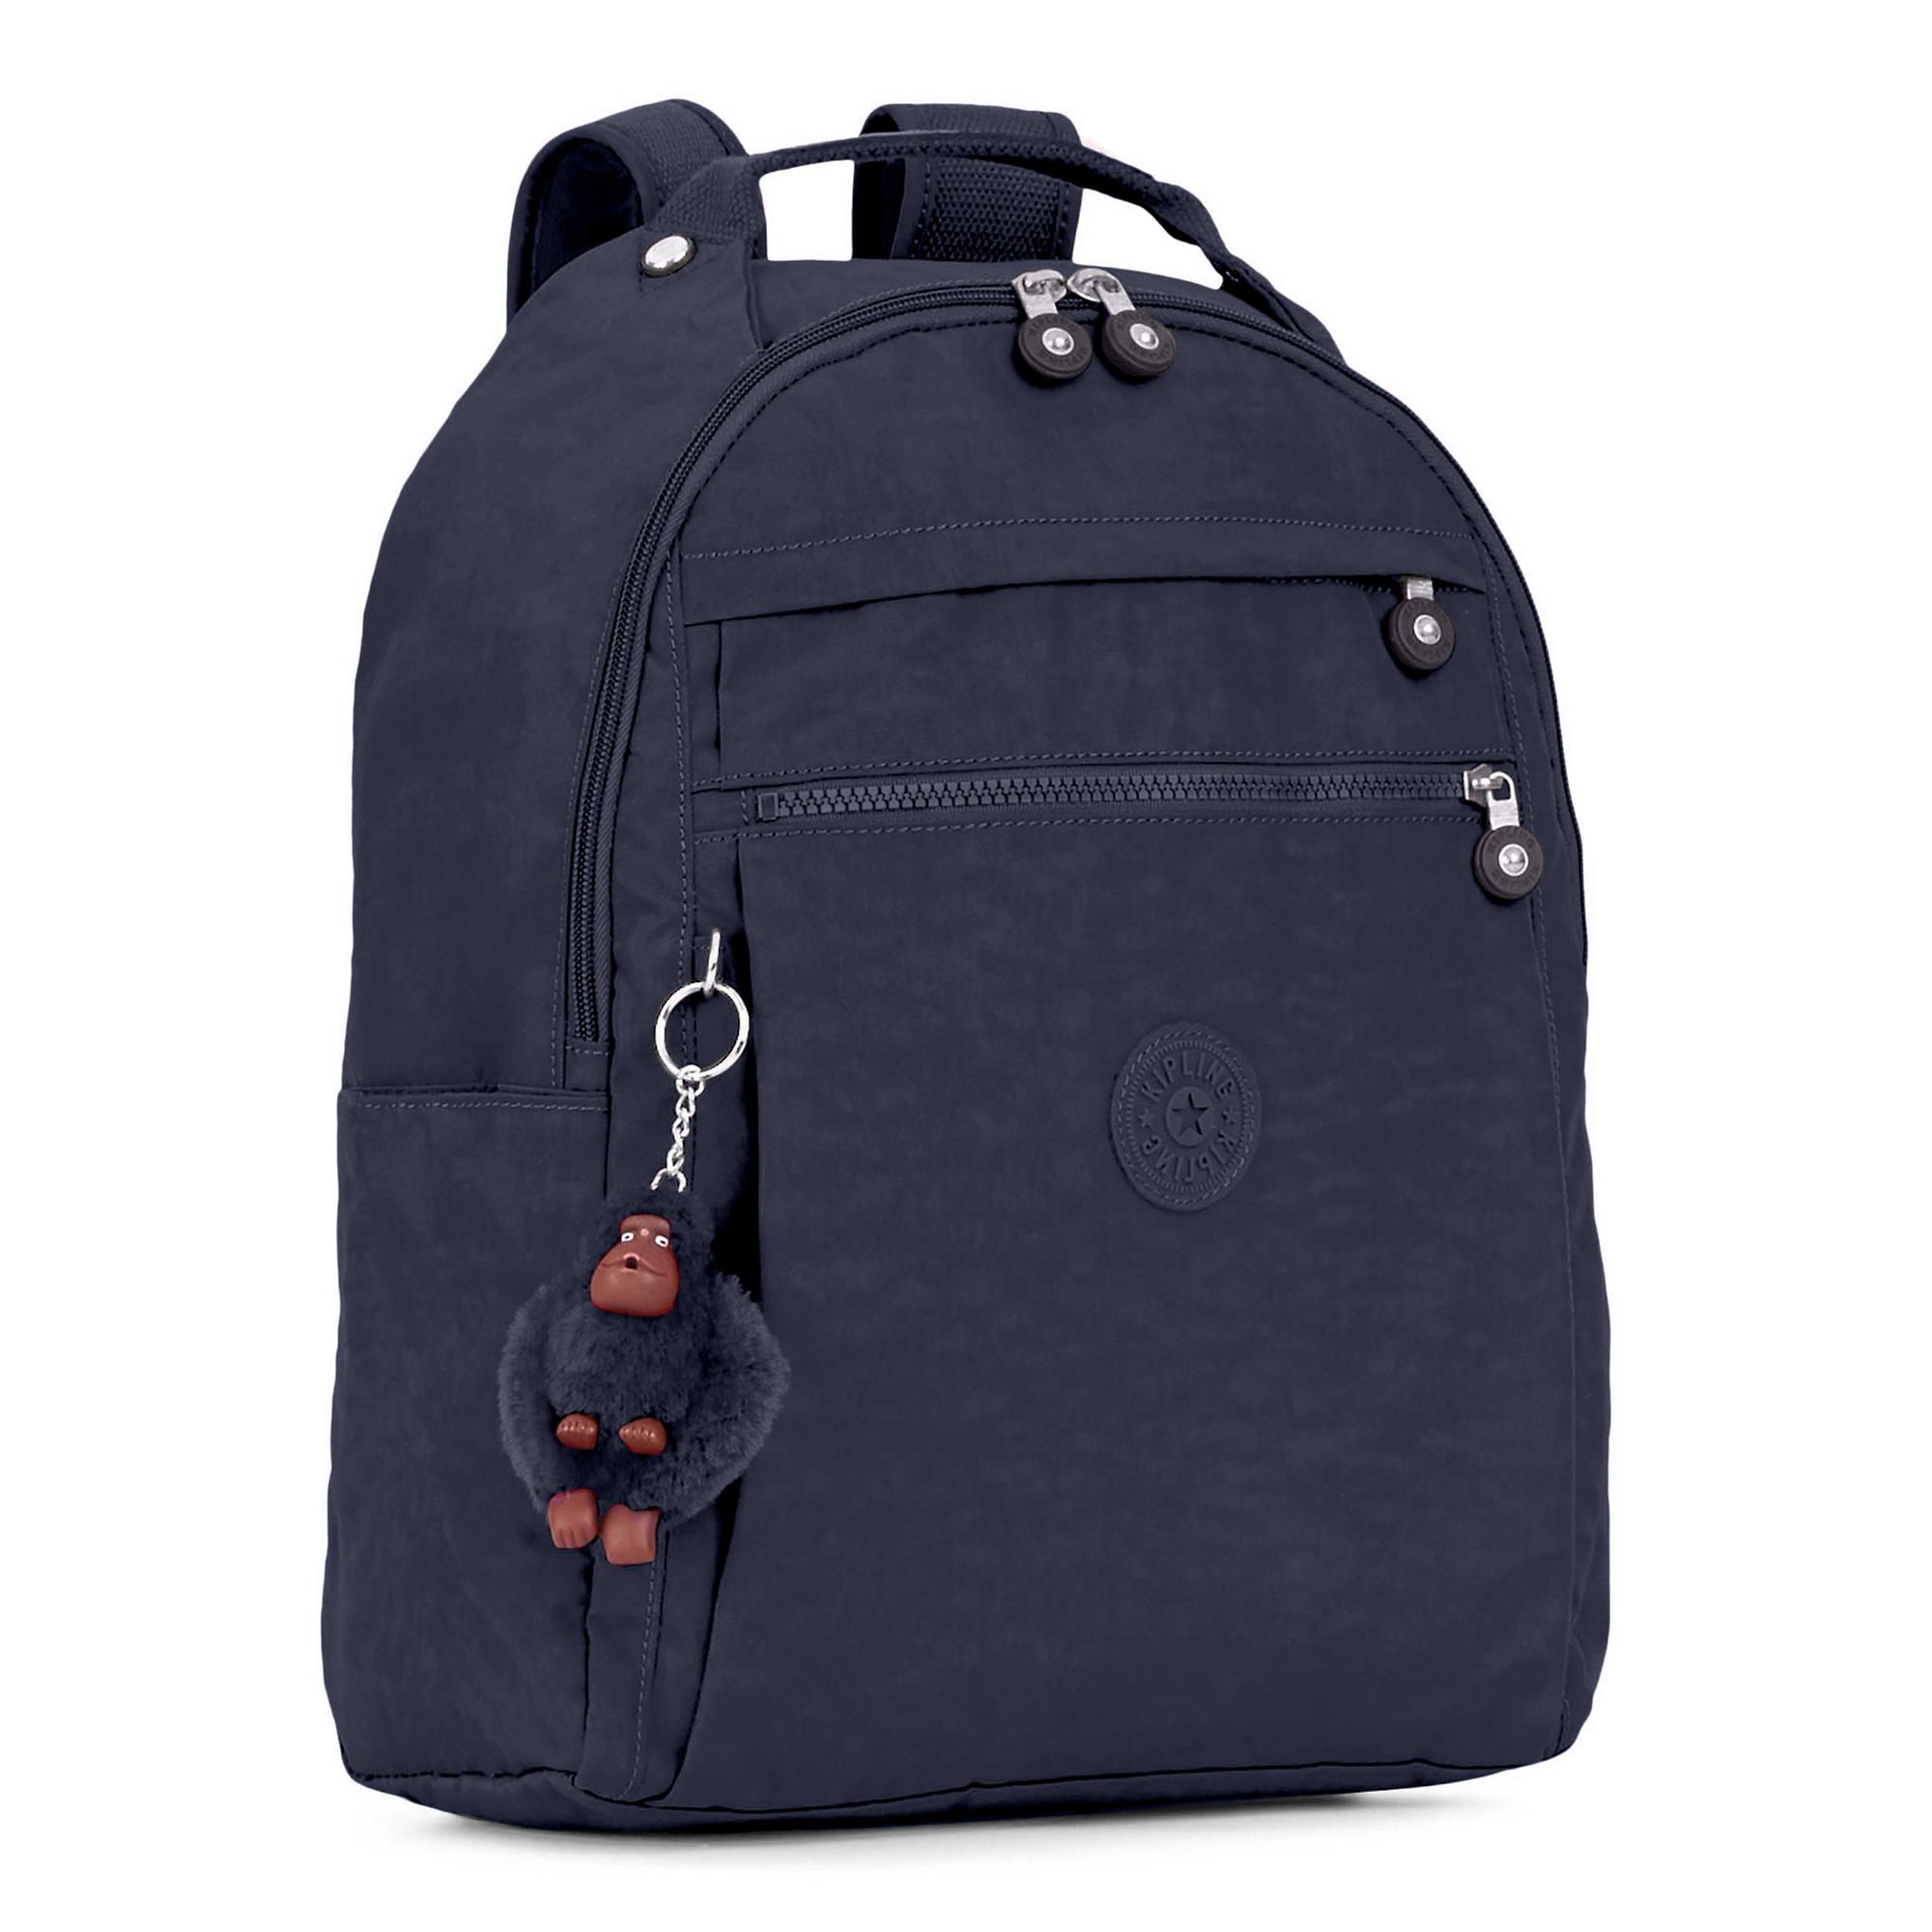 Kipling-Micah-Medium-15-034-Laptop-Backpack 9f8382323ed67